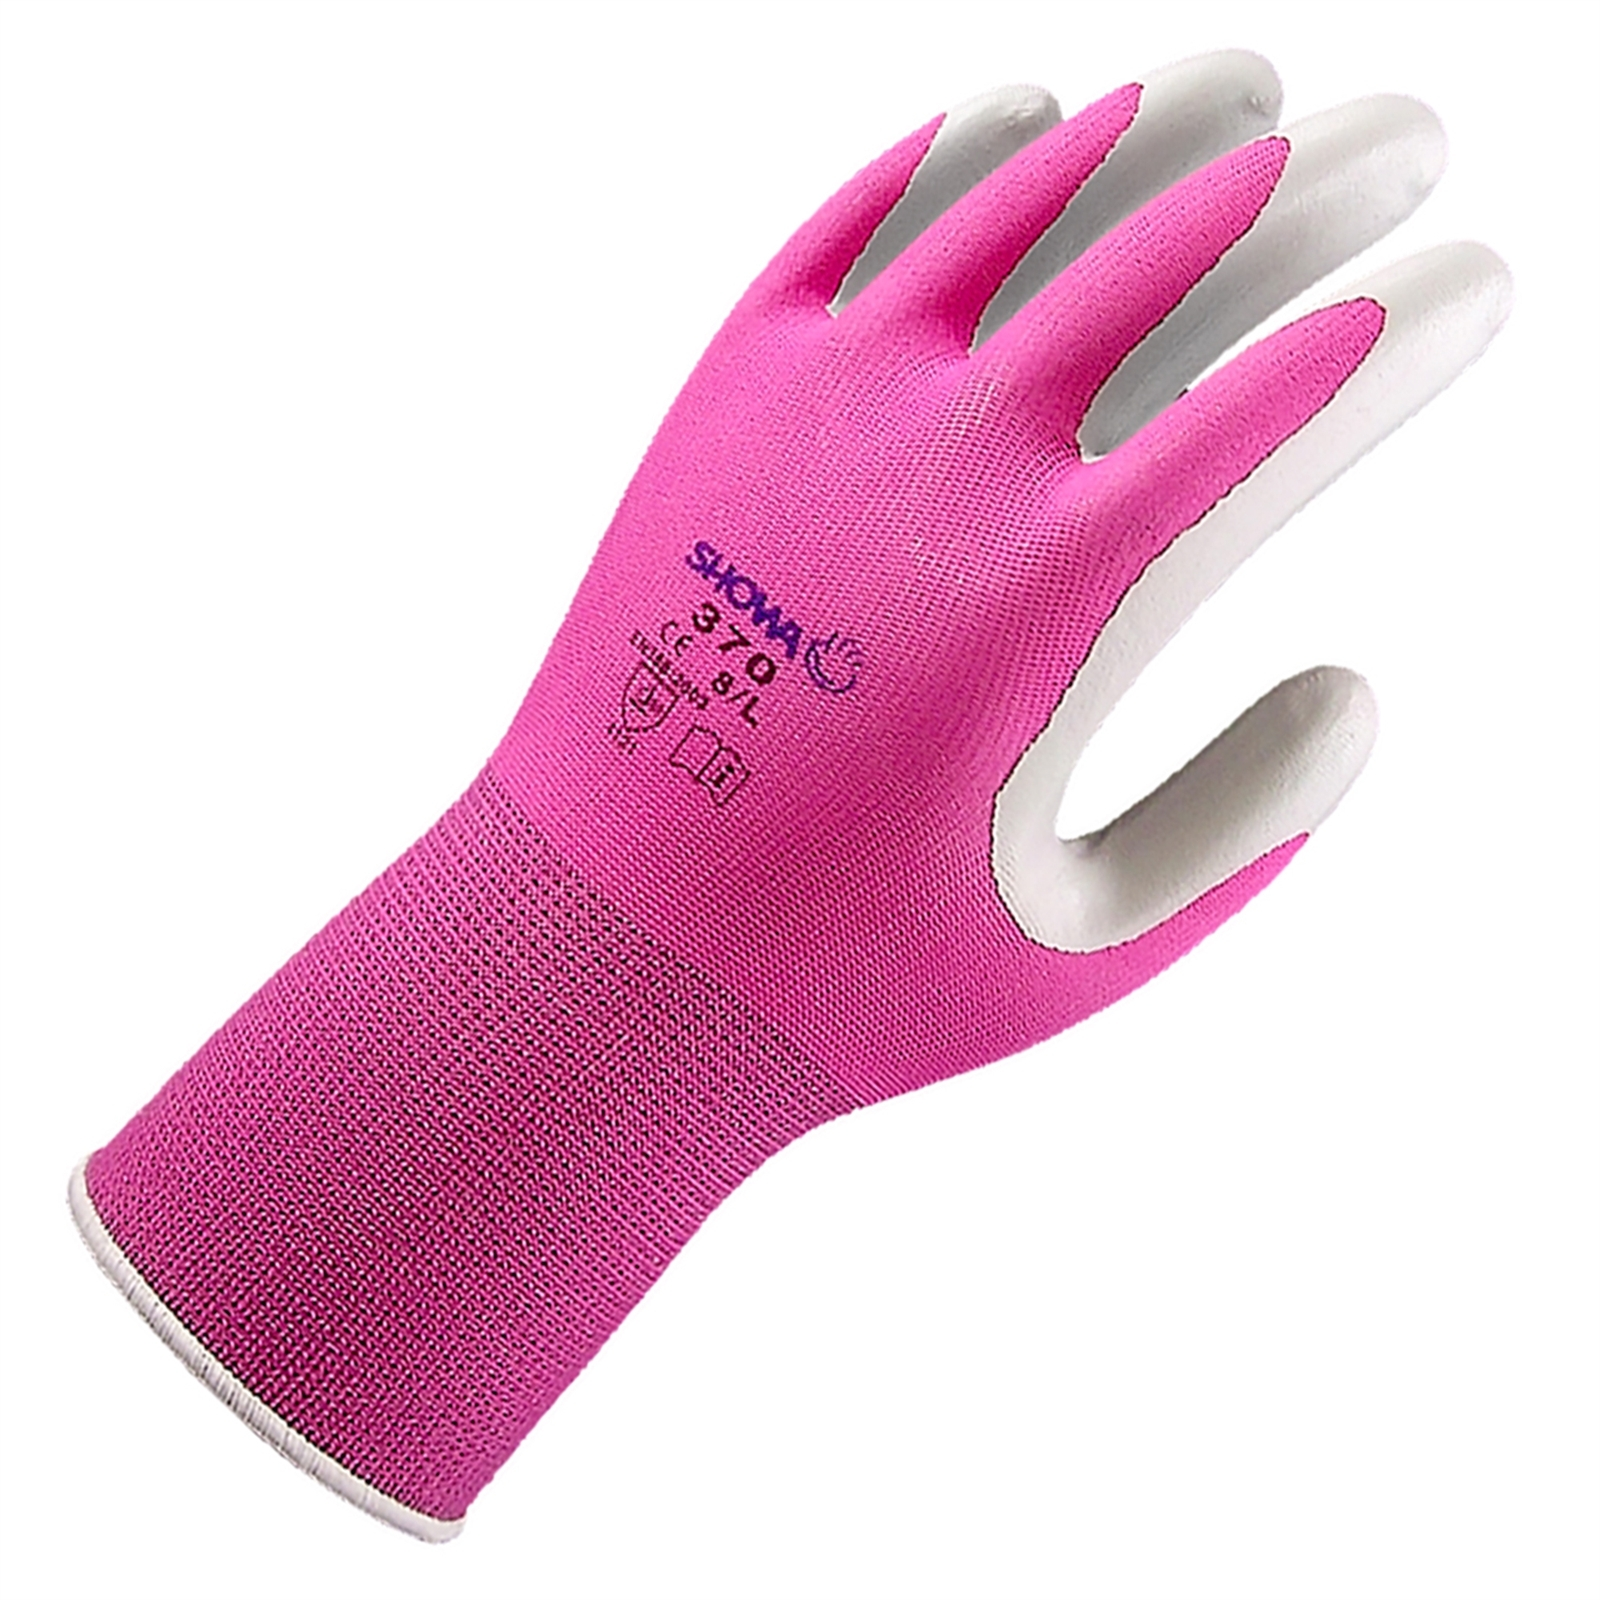 Lynn River Medium Multi-Coloured Showa 370 Nitrile Gardening Gloves